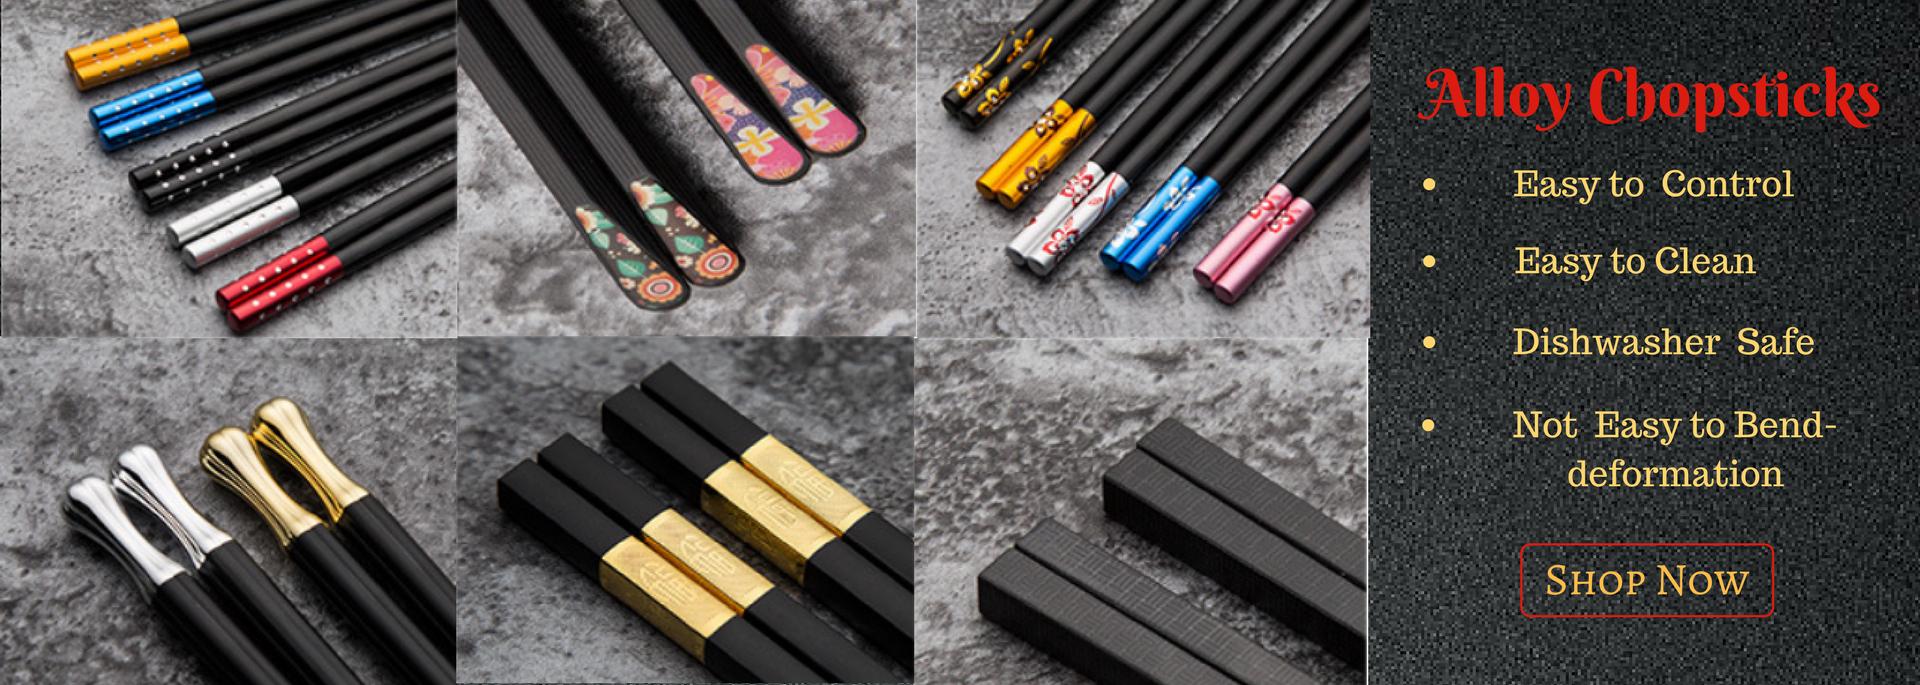 Alloy Chopsticks | WhiteStone